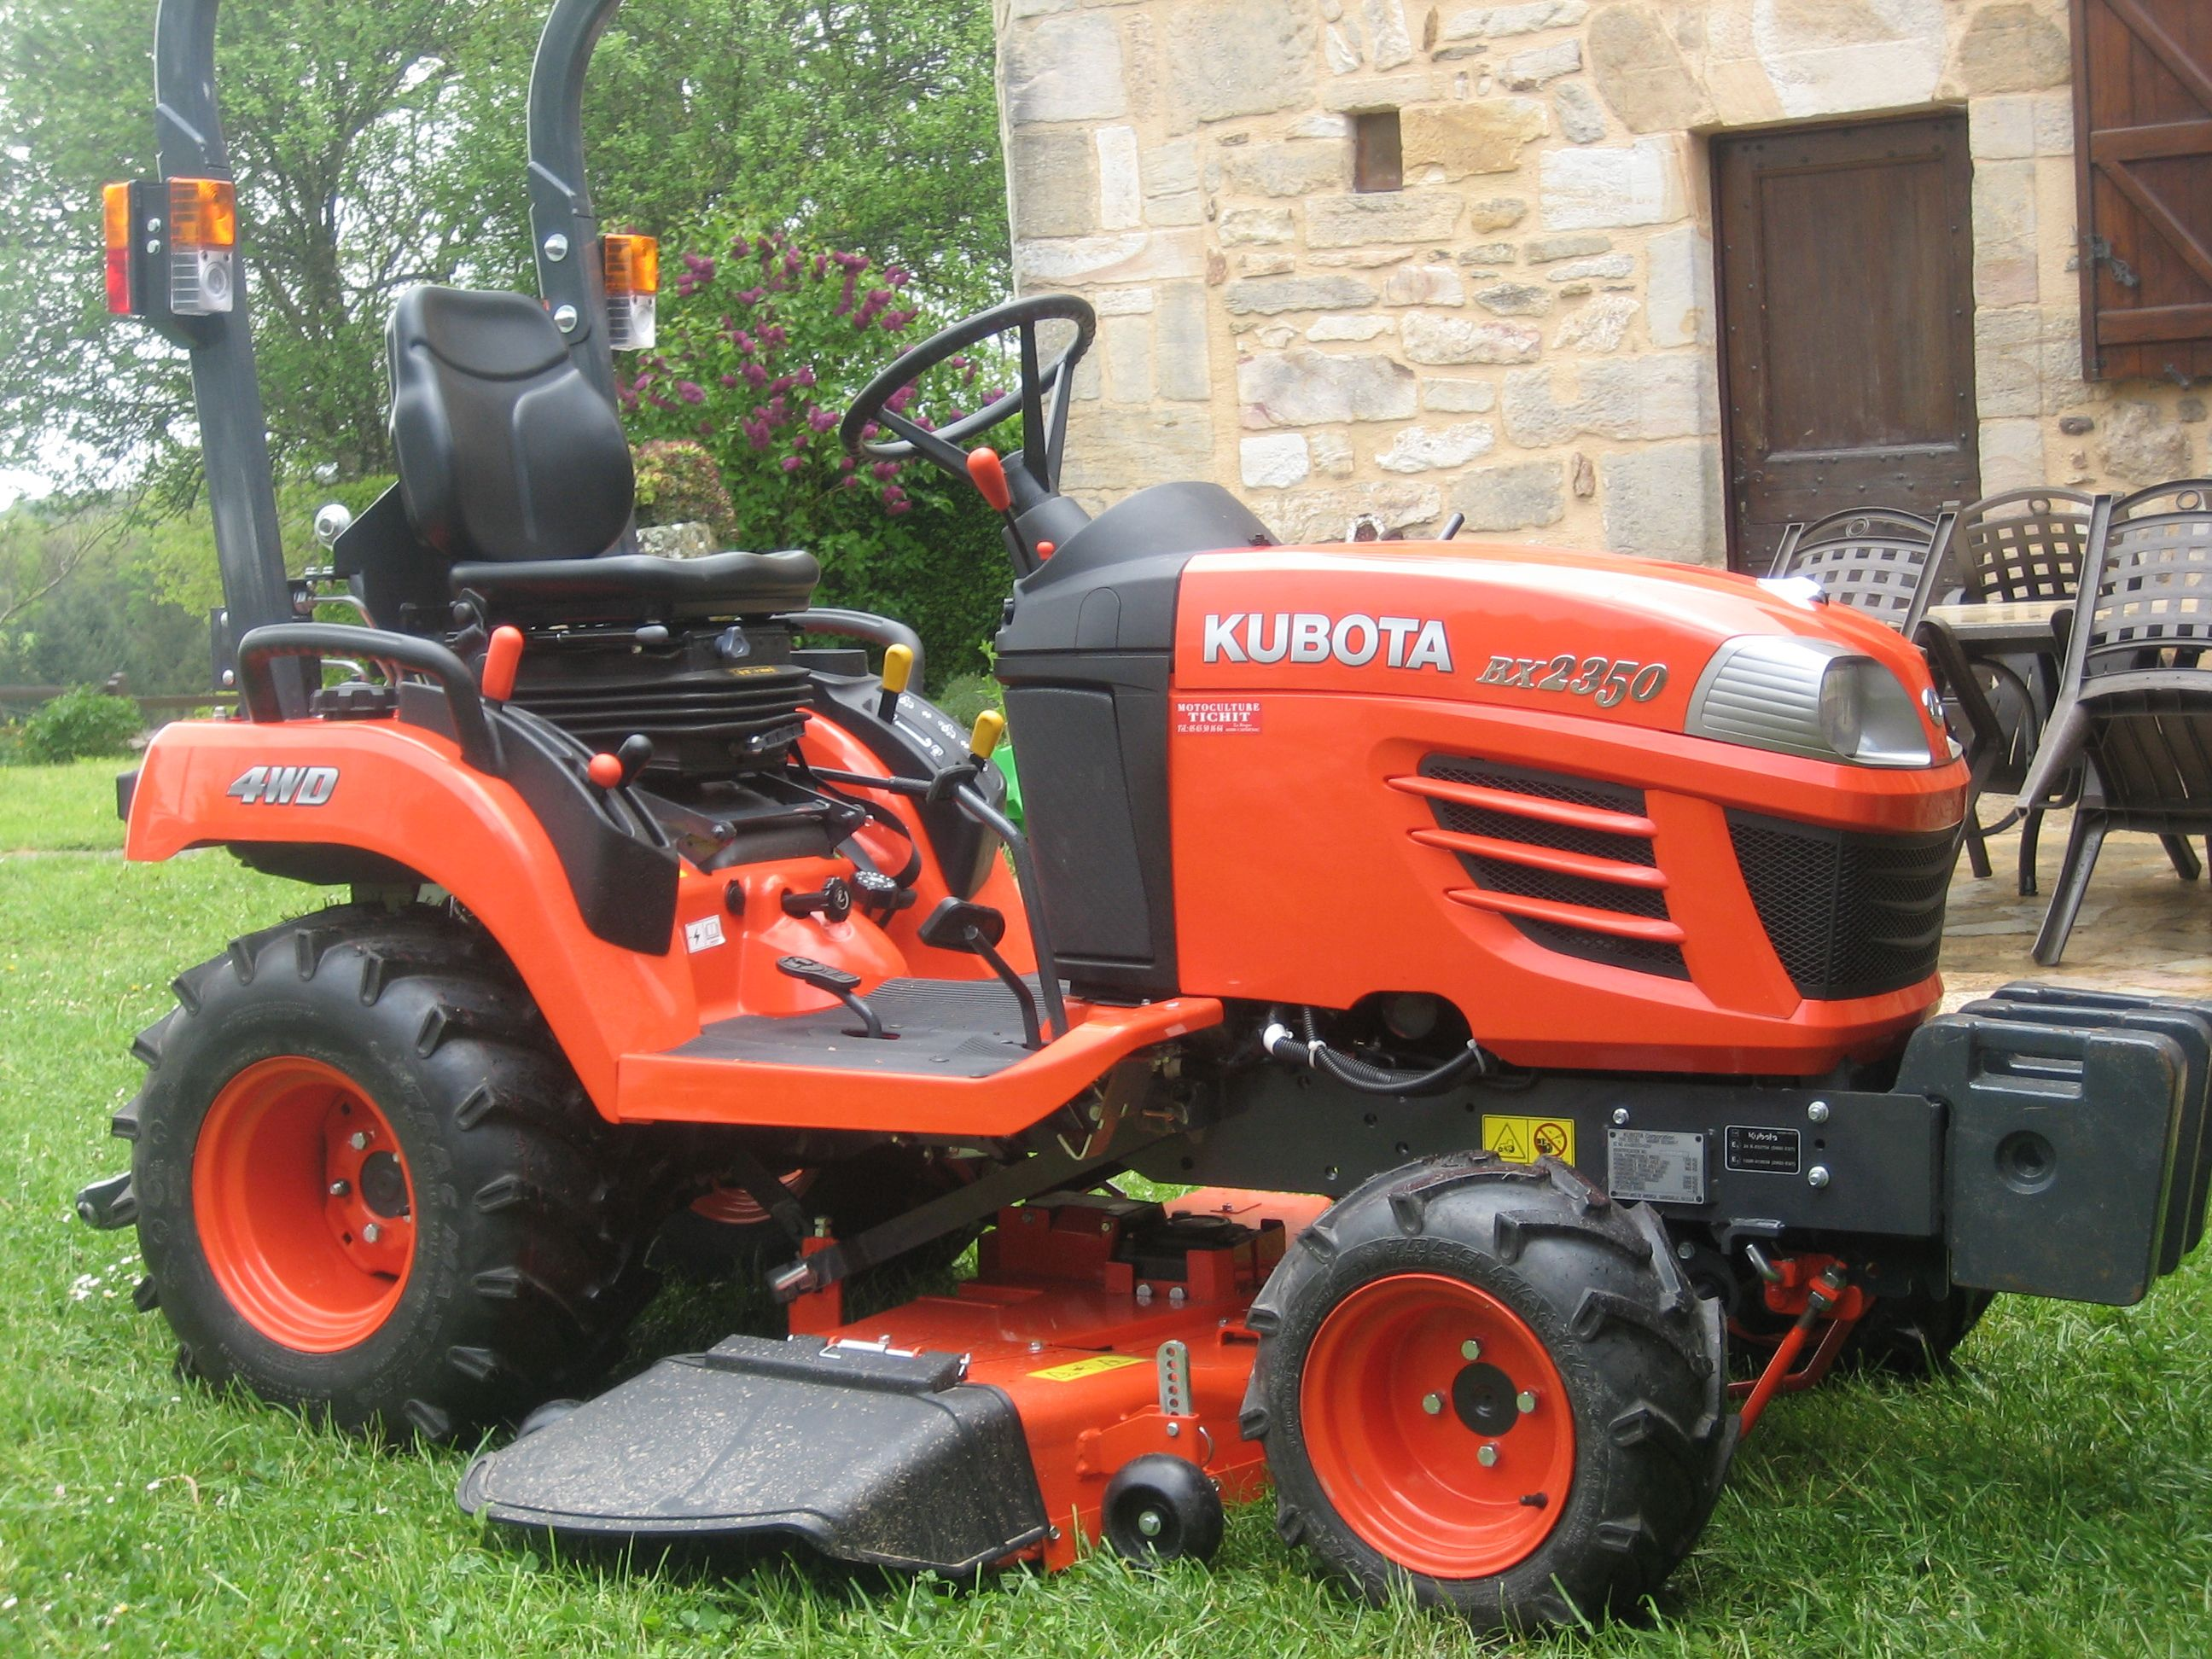 kubota g2160 wiring diagram 96 honda civic power window bx 2350 land pinterest tractor